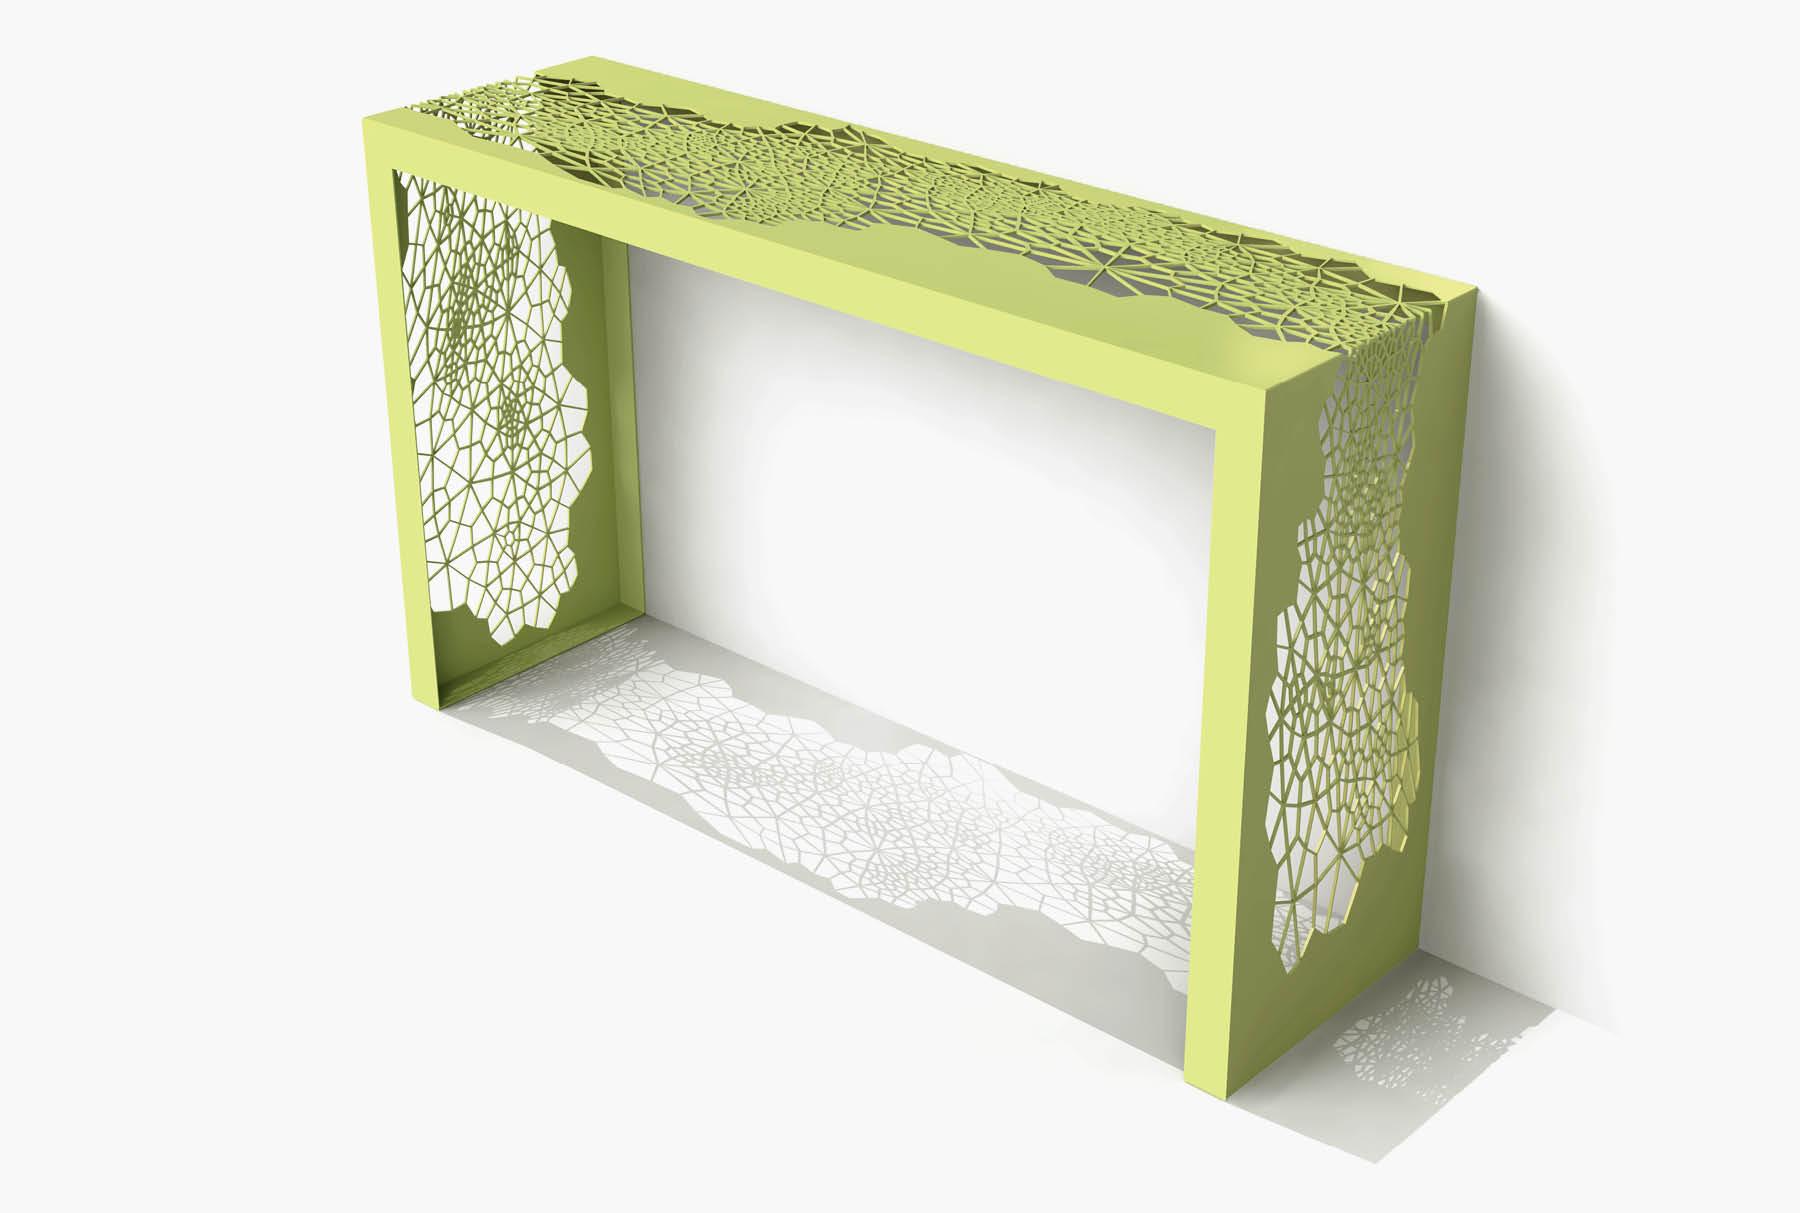 Arktura Hive Console in Lush Green